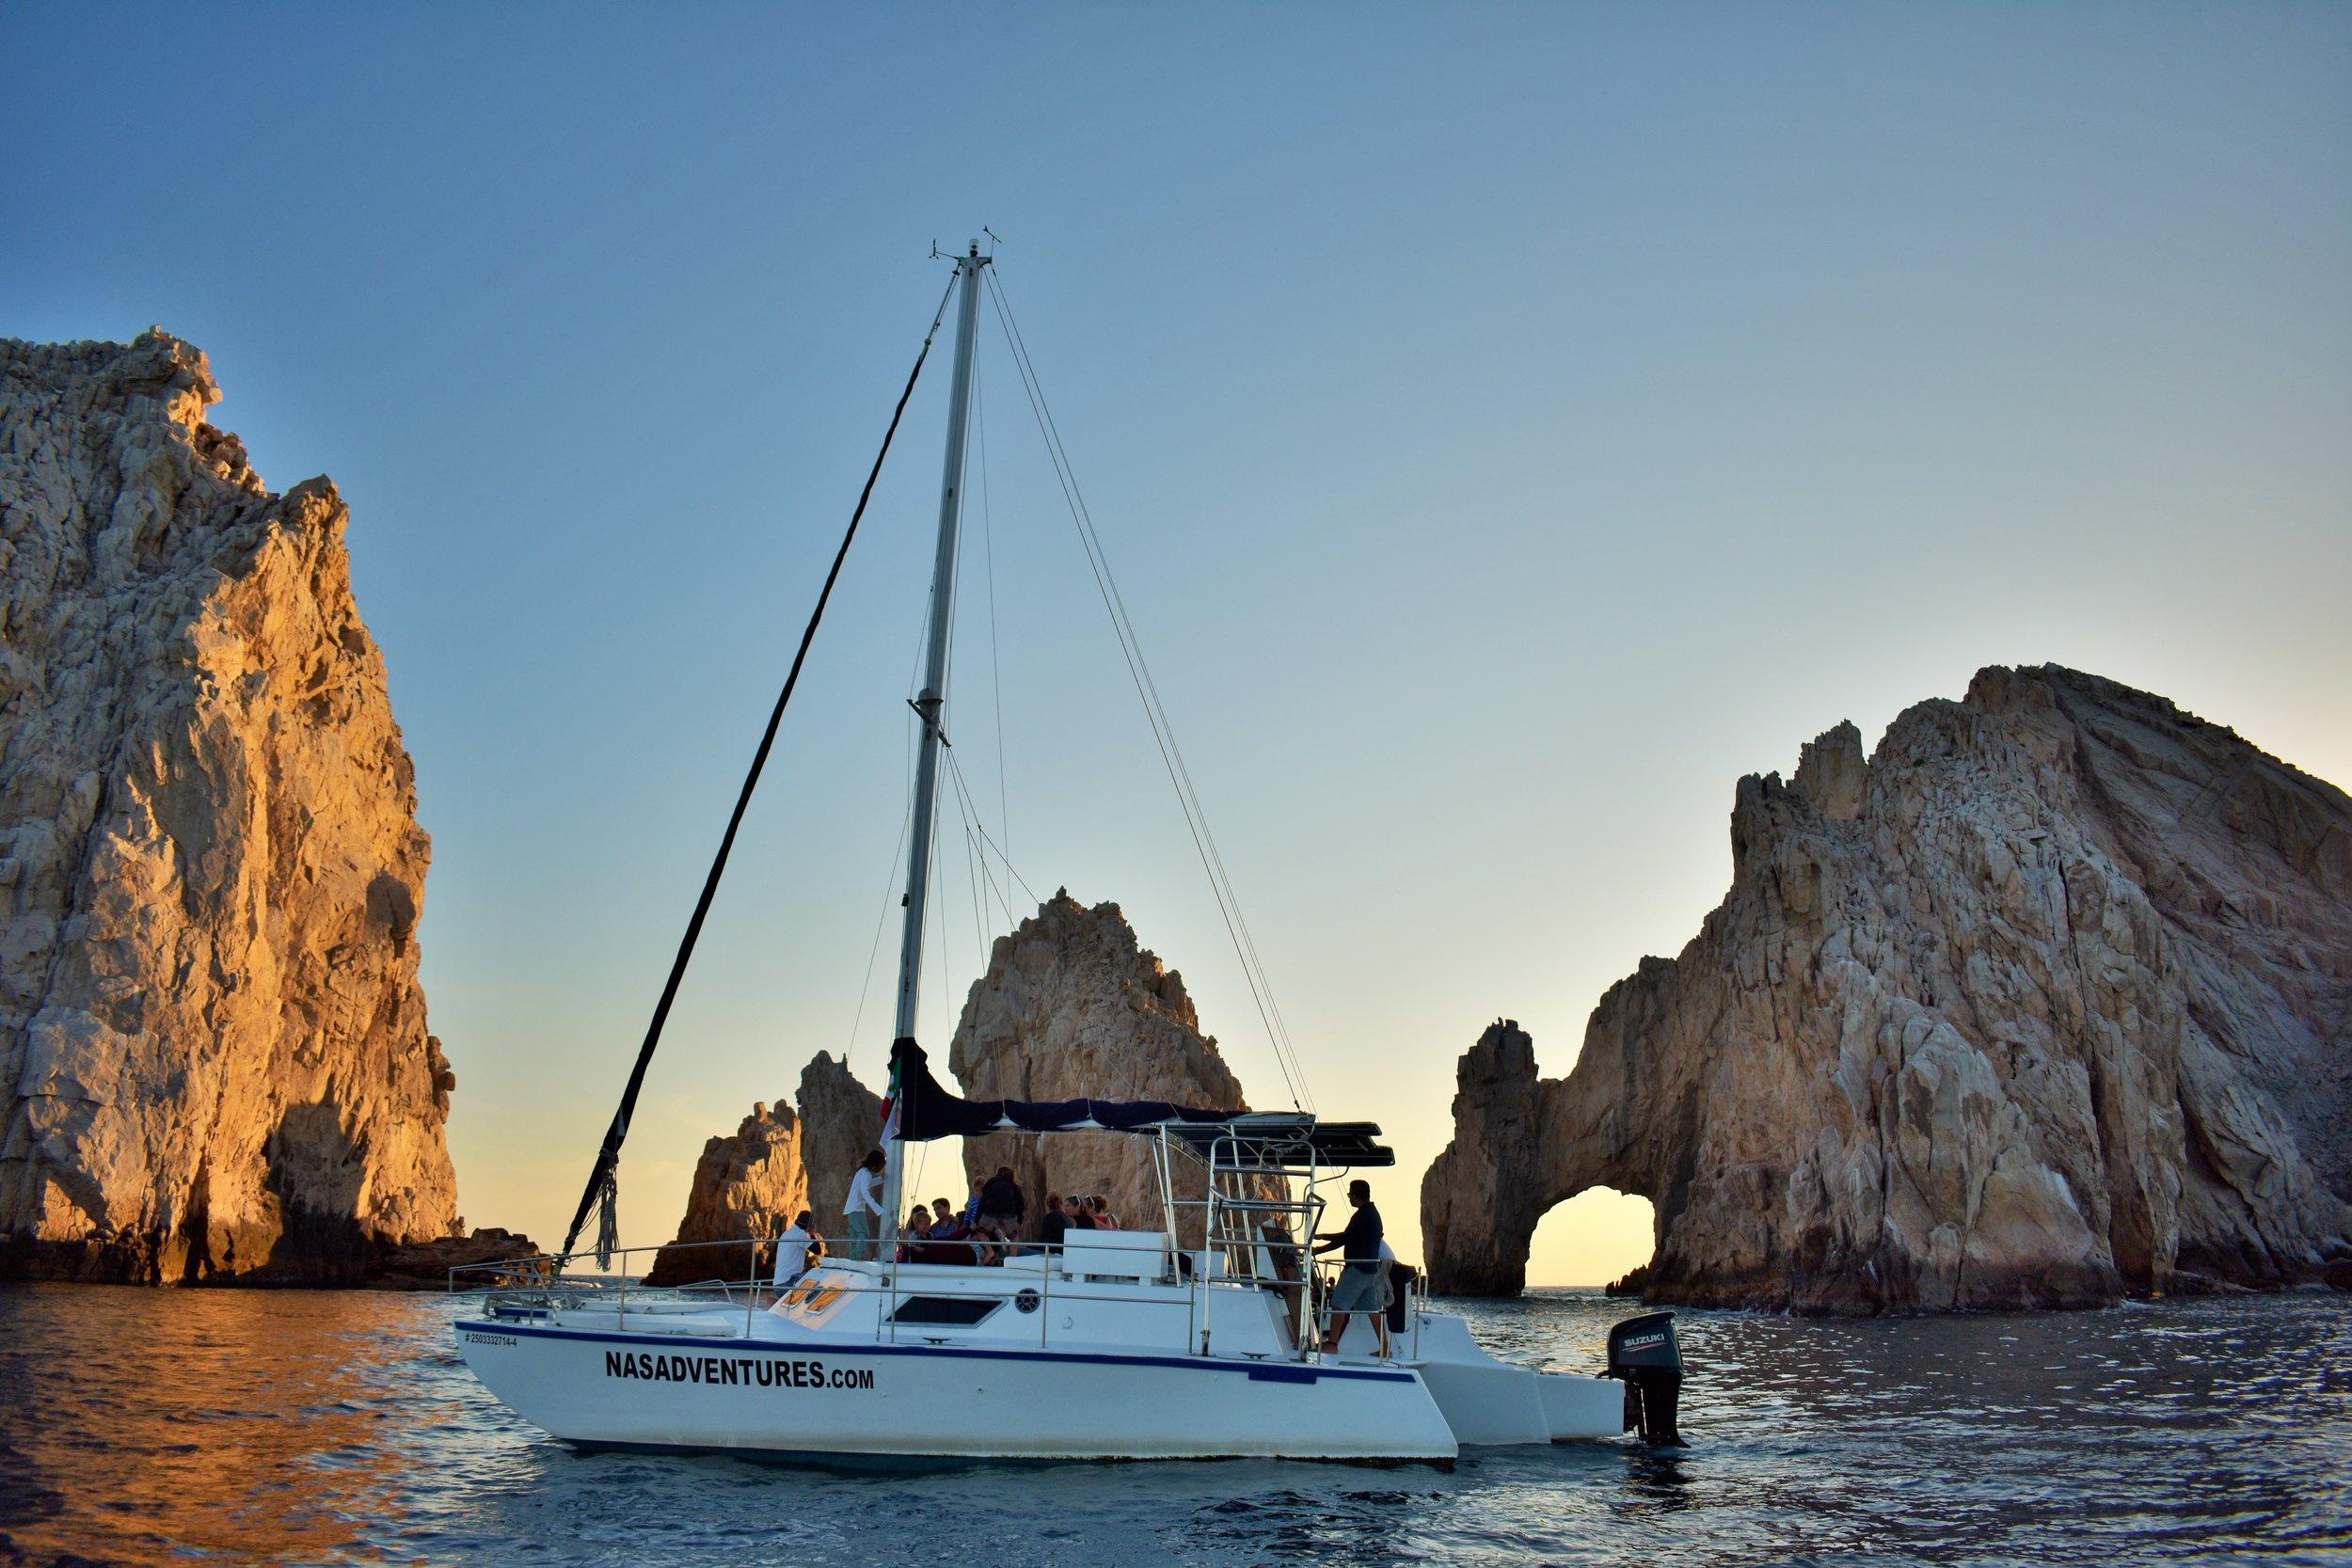 NAS ADVENTURES Eco-friendly Sailboat.JPG